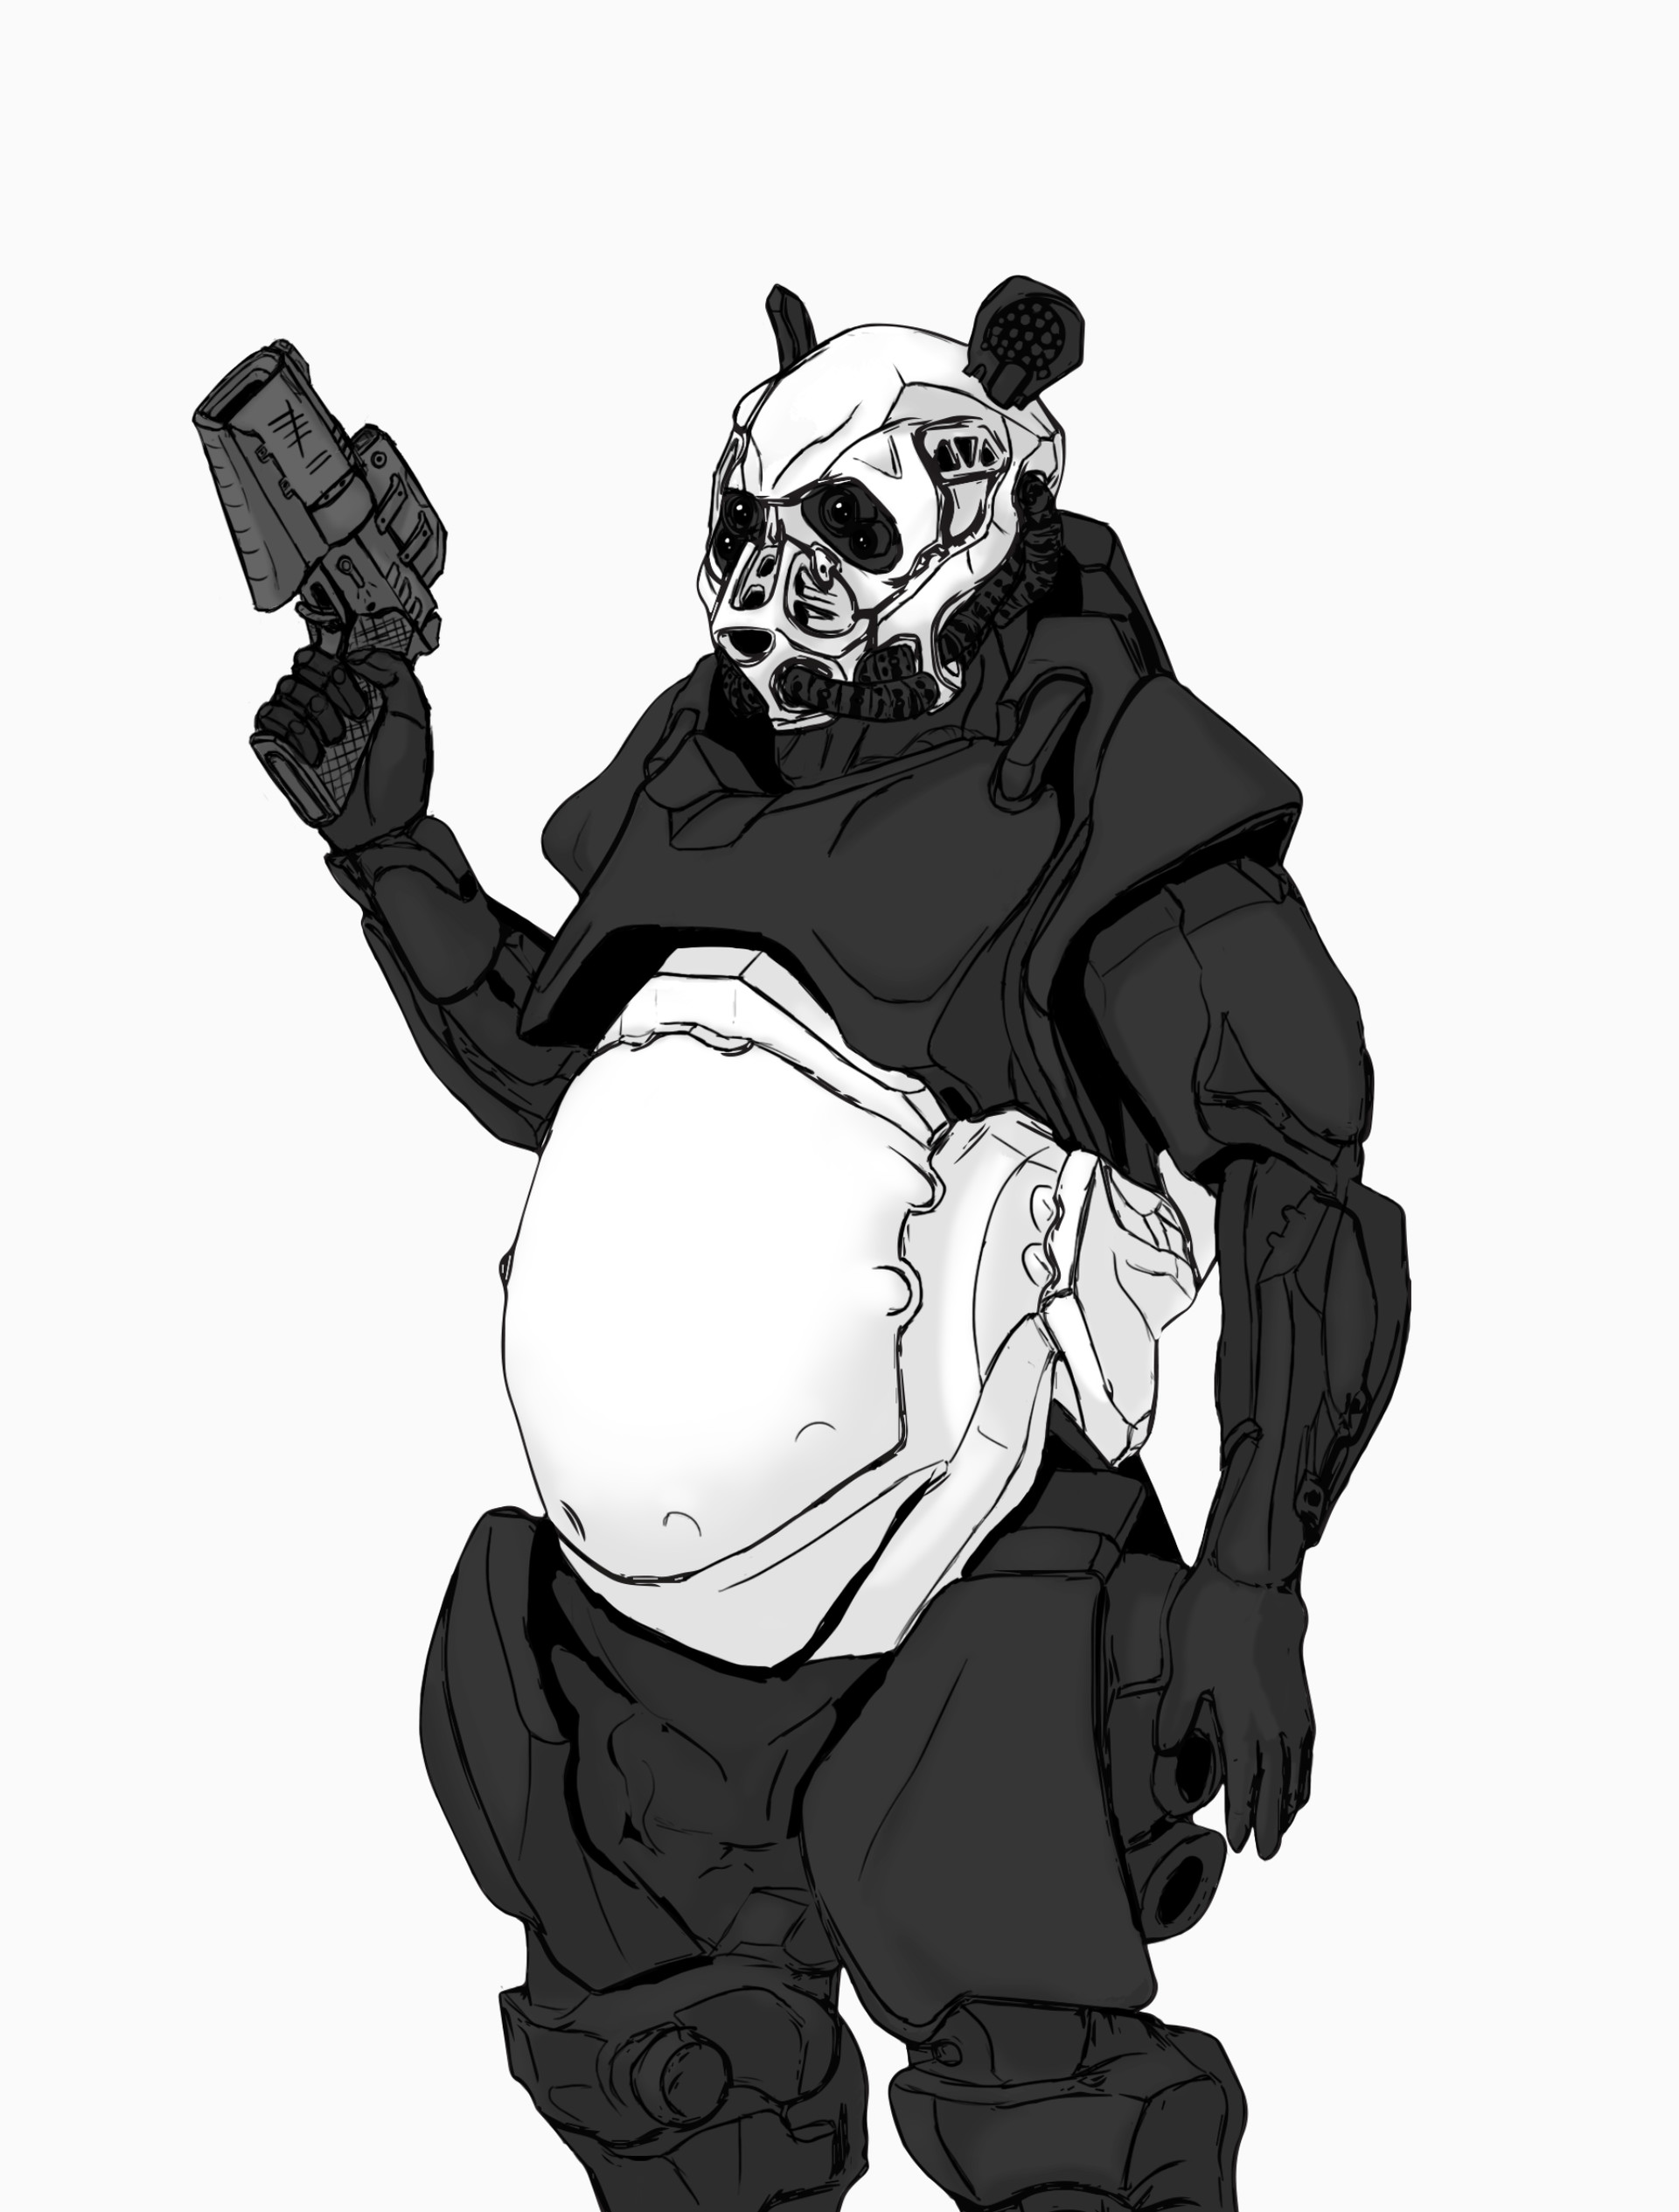 Danas matusevicius panda empty